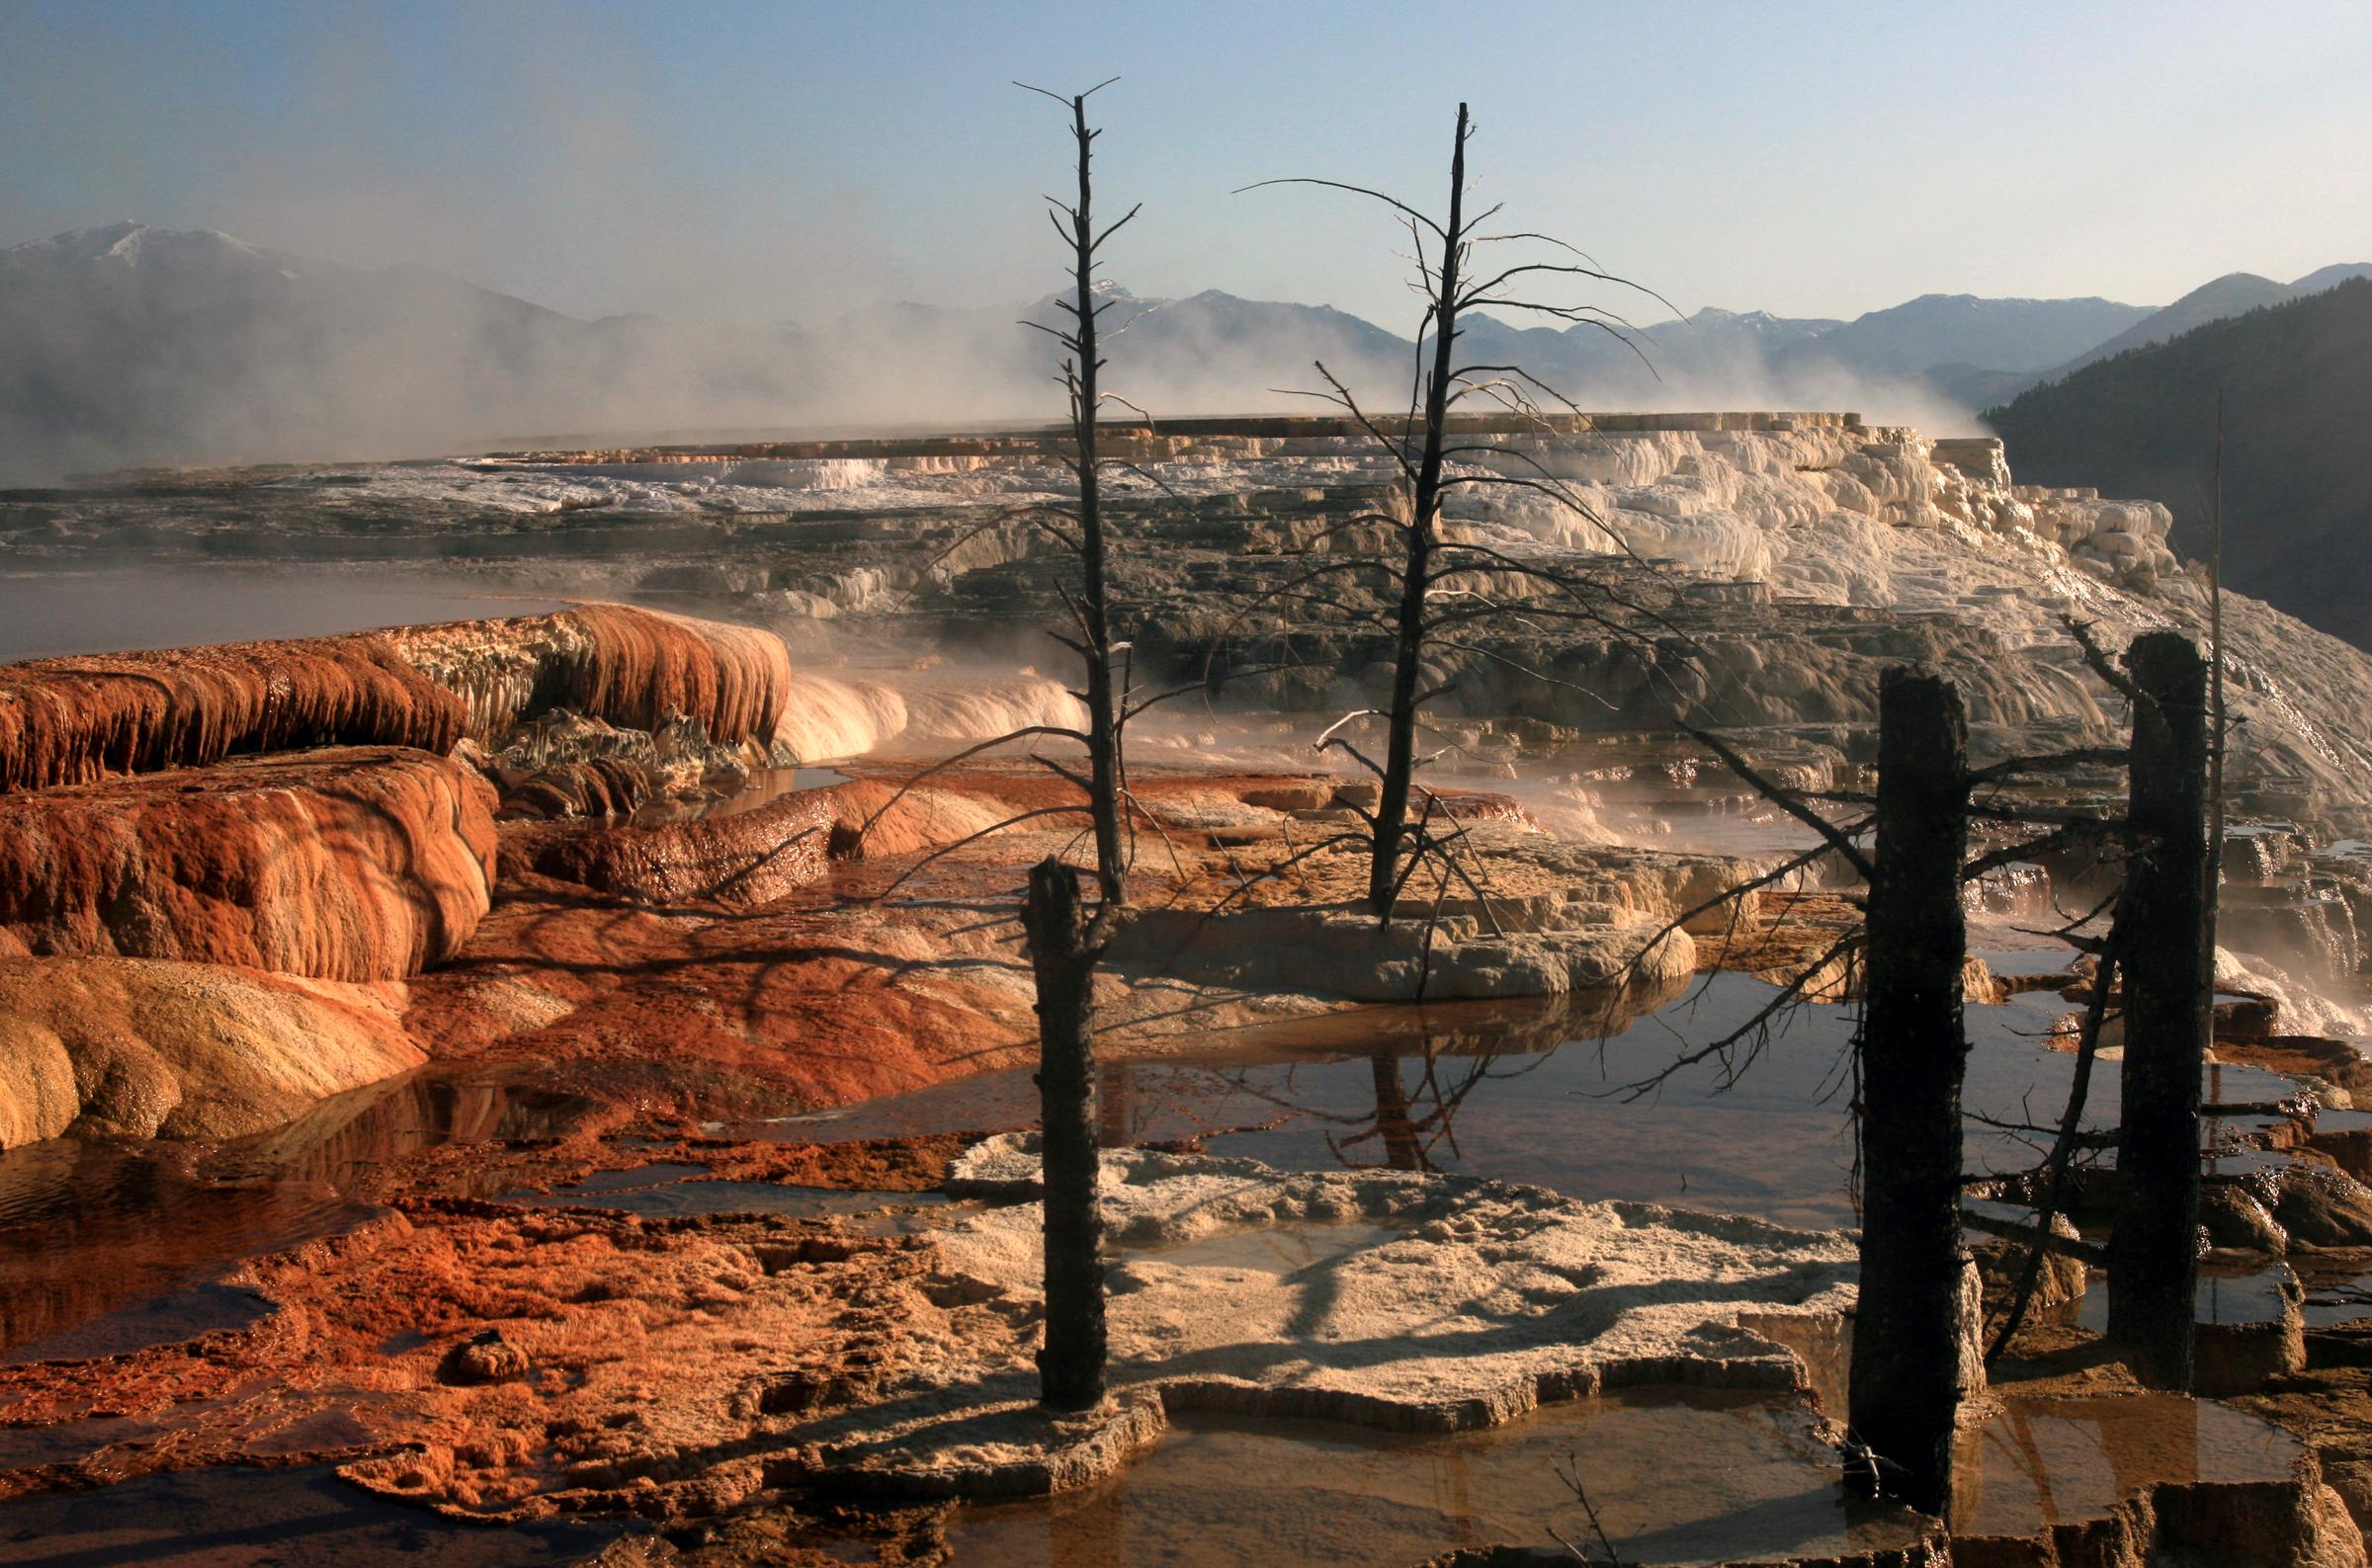 Depiction of Parque nacional de Yellowstone